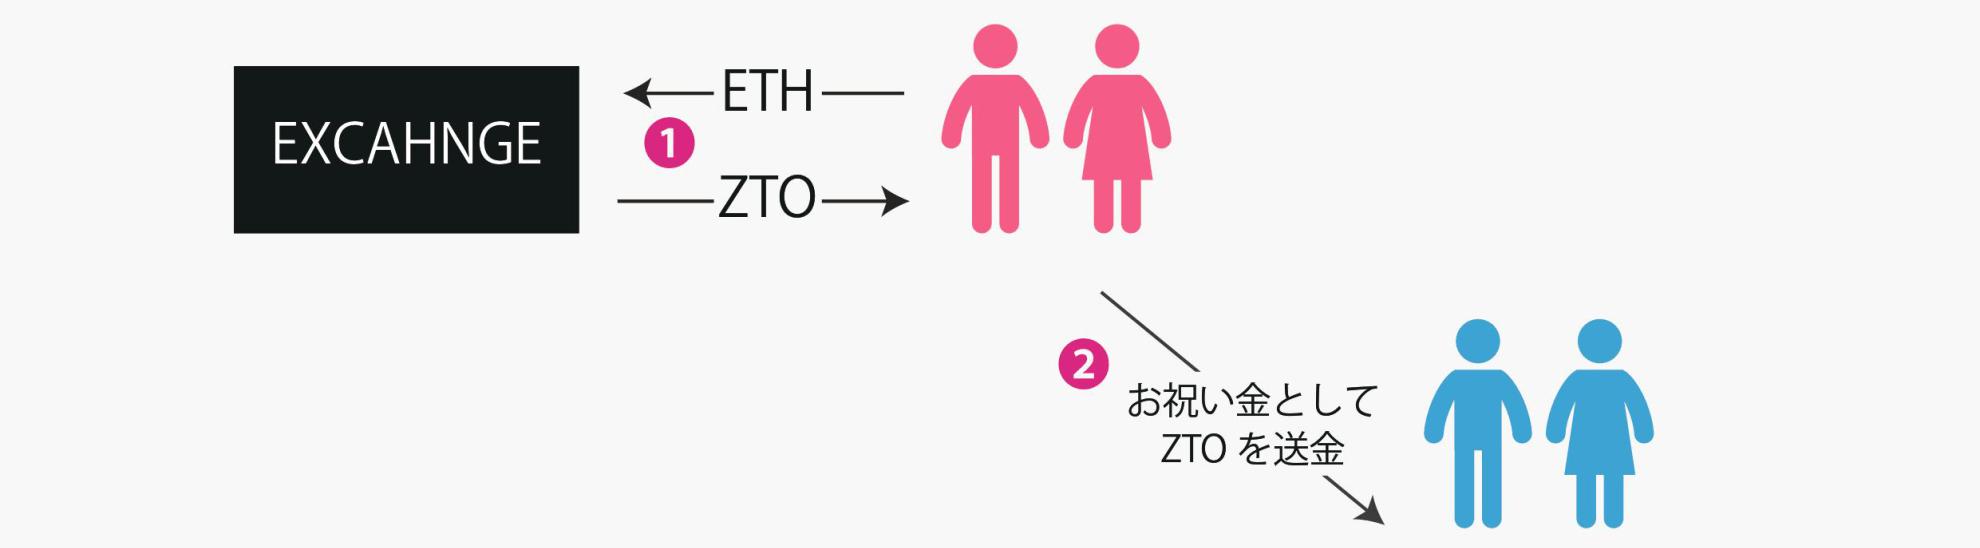 ZUTTO Coin 使い方3